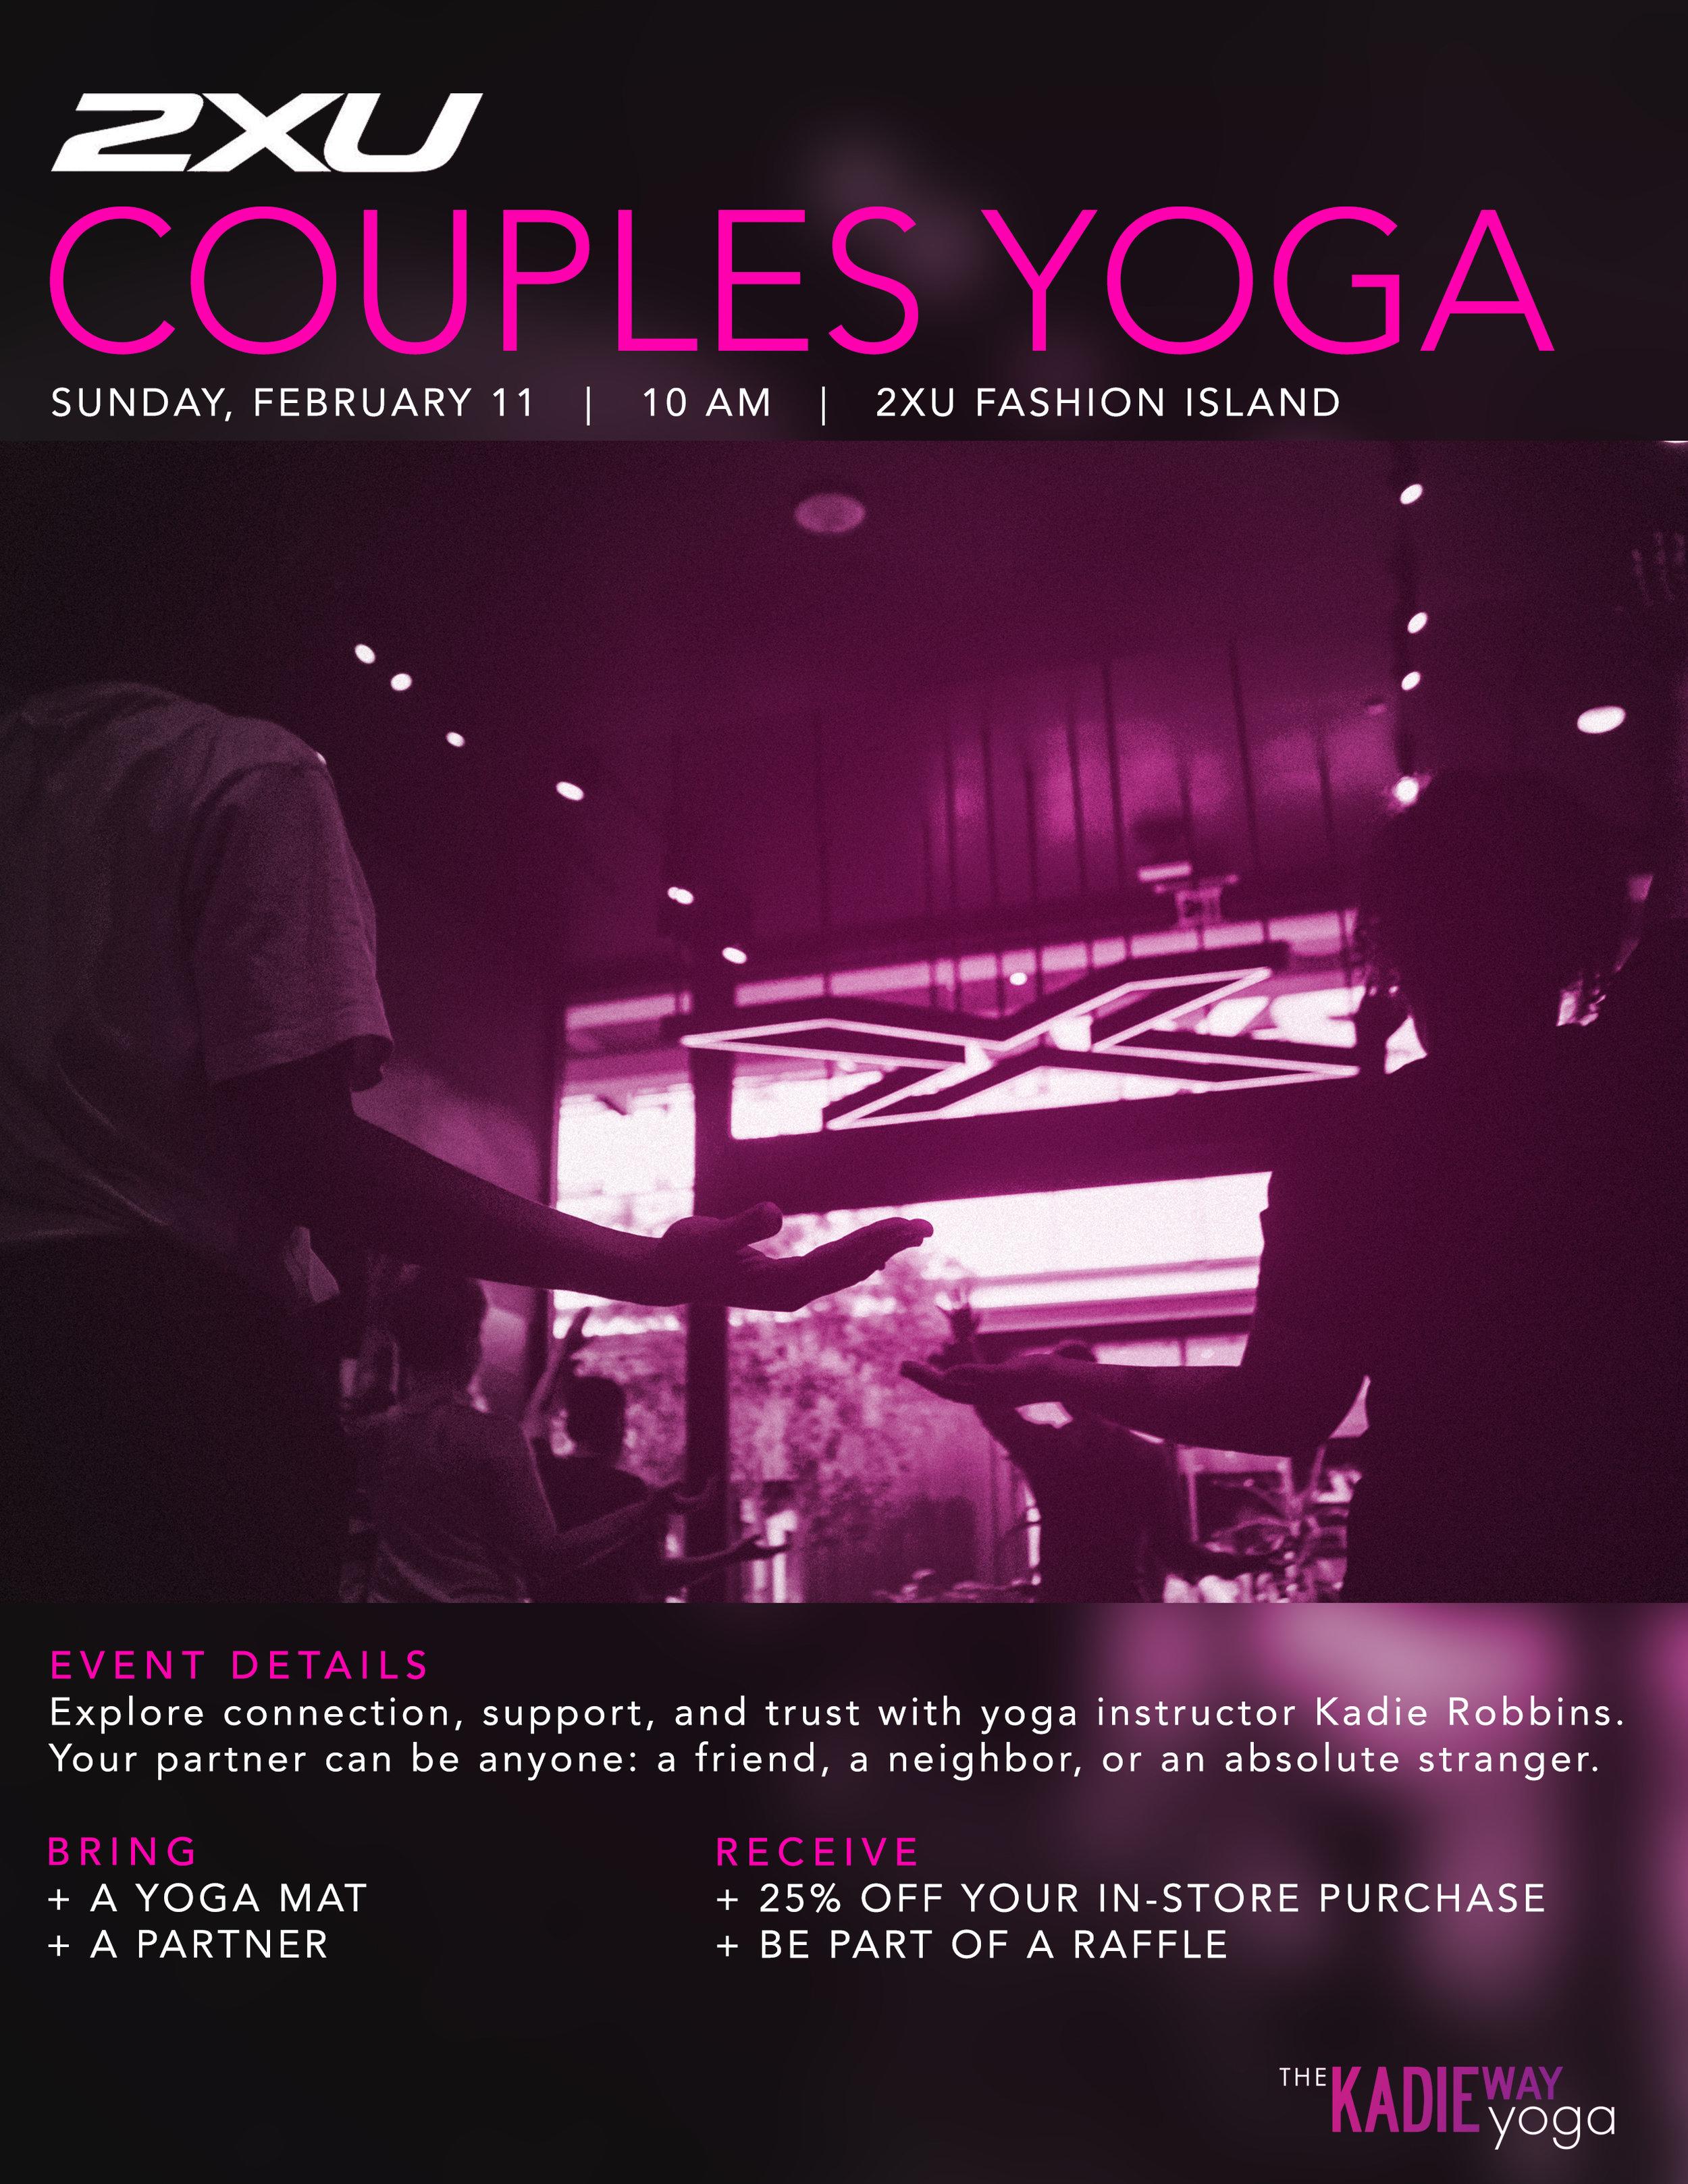 NPB_Couples_Yoga_2xu.jpg